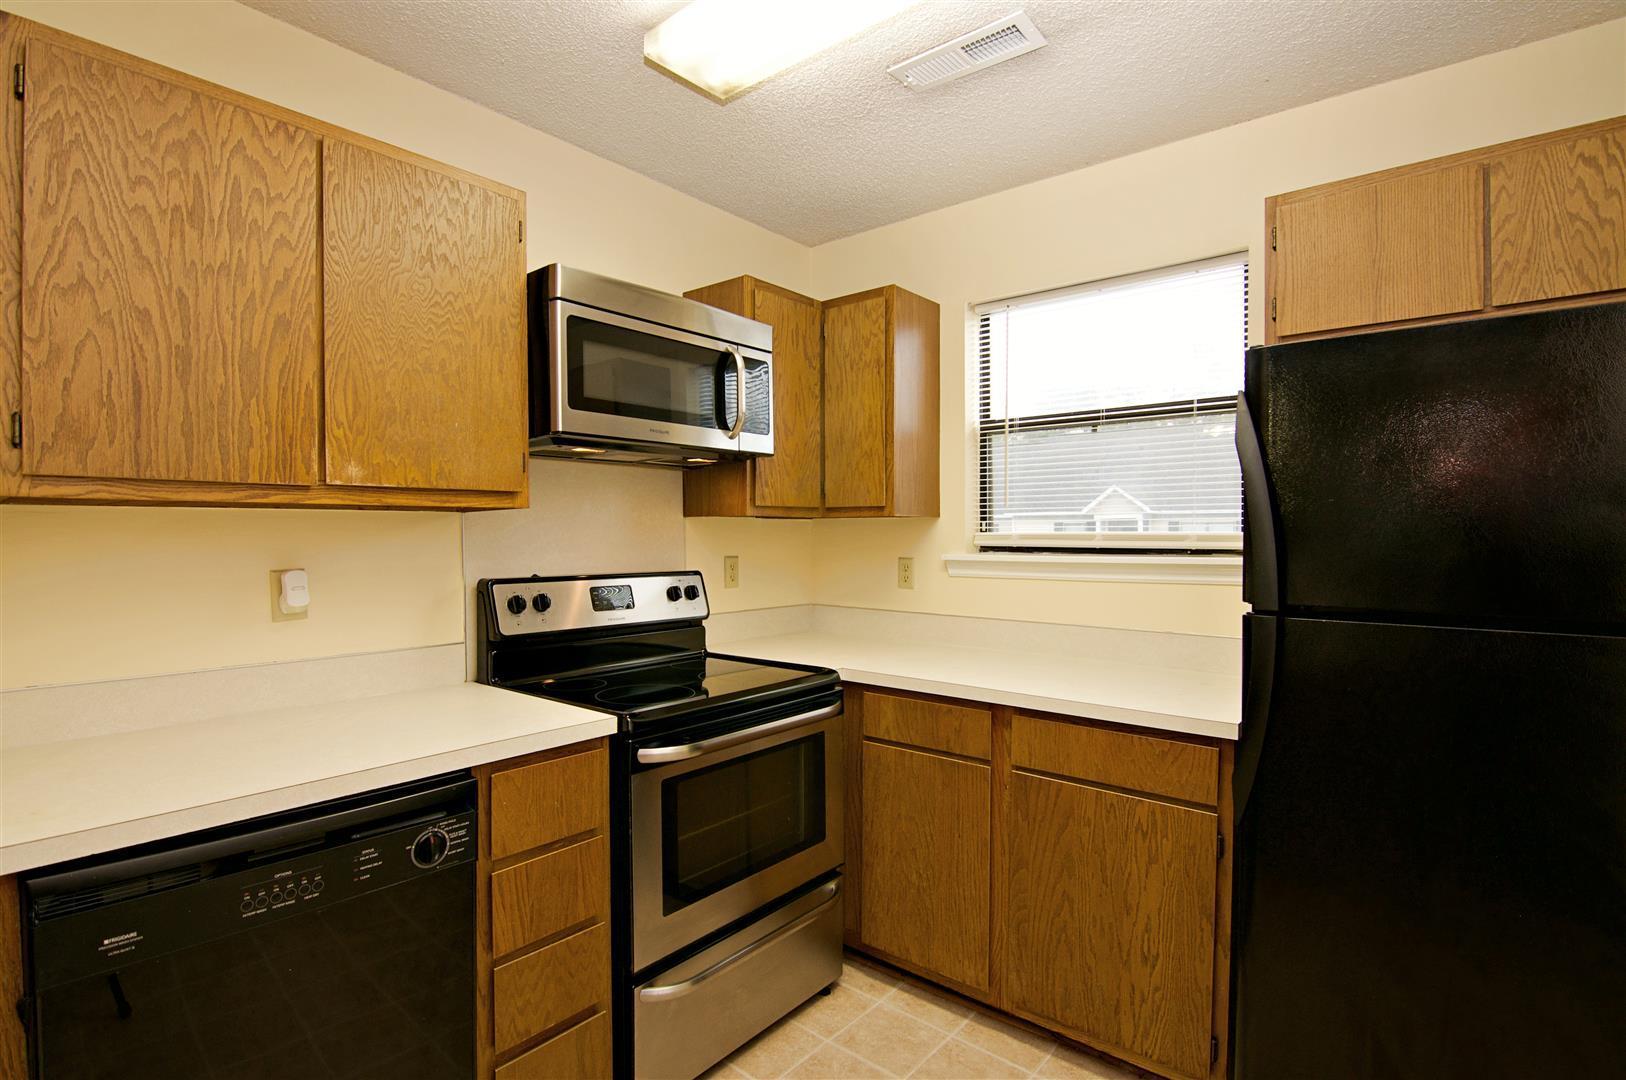 Shaftesbury Woods Homes For Sale - 931 Estates, Charleston, SC - 14